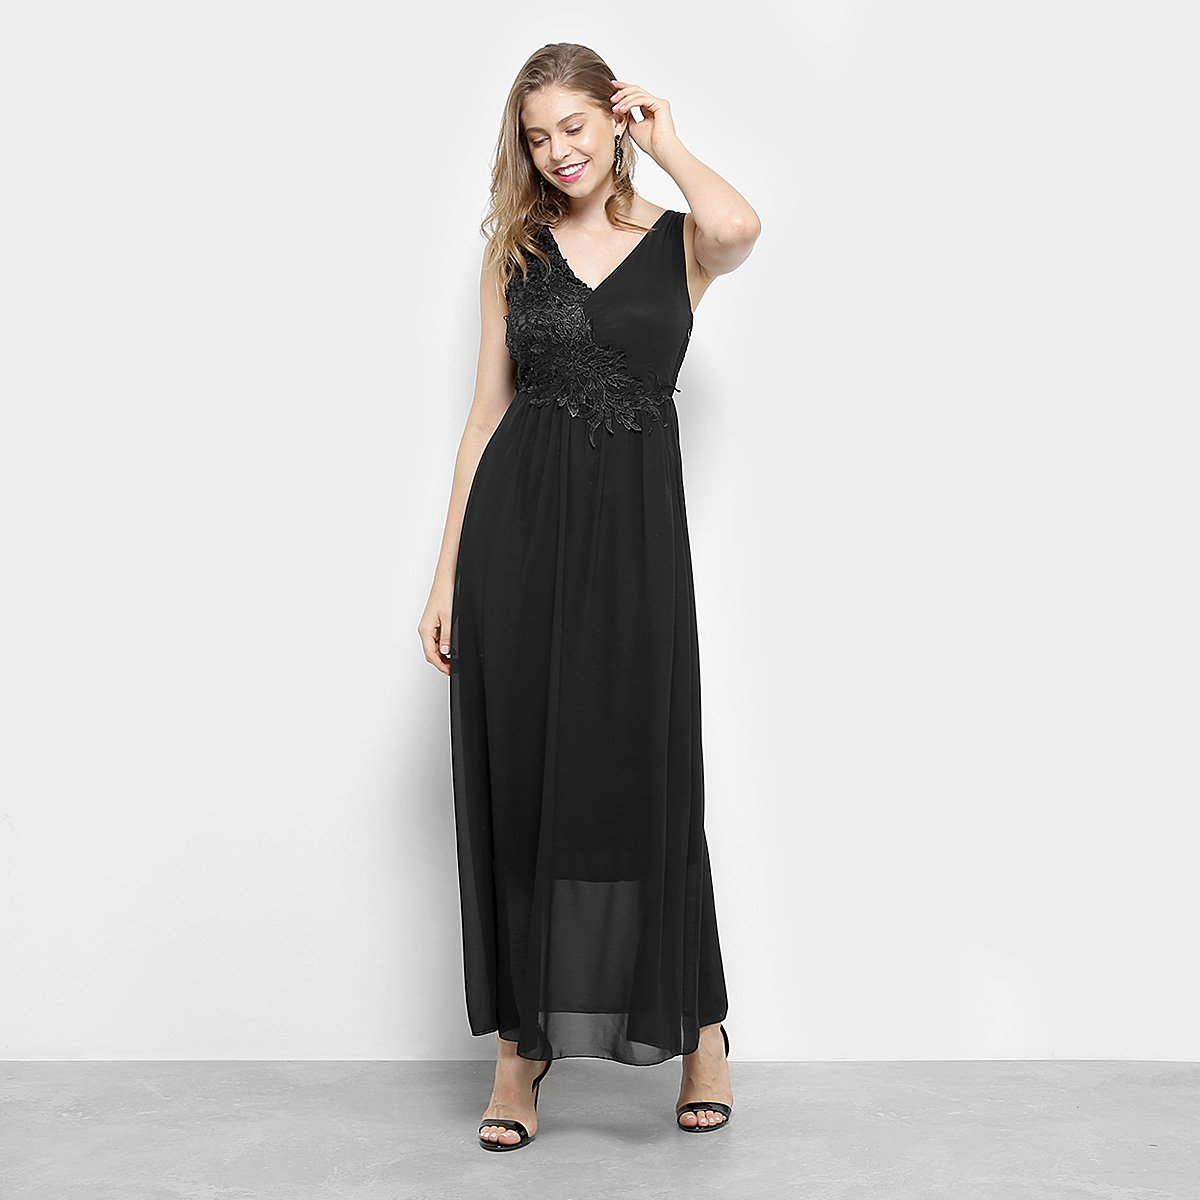 a224dc8b7b Vestido Lily Fashion Evasê Longo Renda Decote V Feminino. undefined